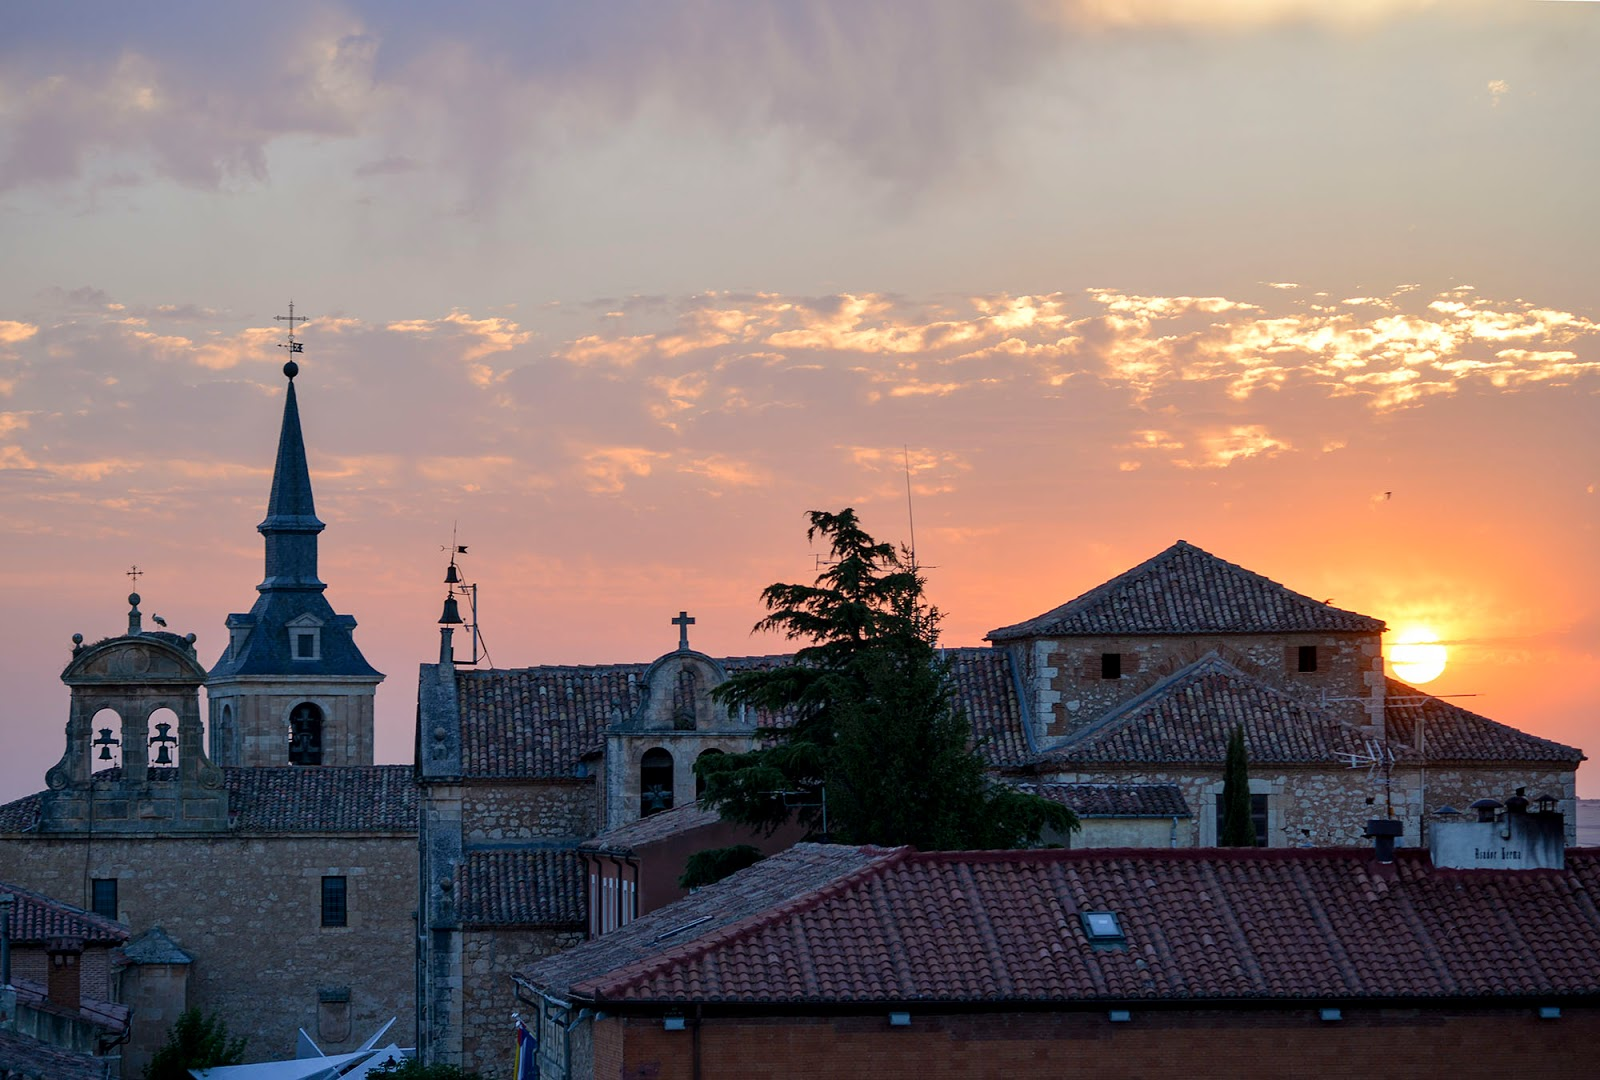 lerma burgos spain castile leon sunset beautiful village